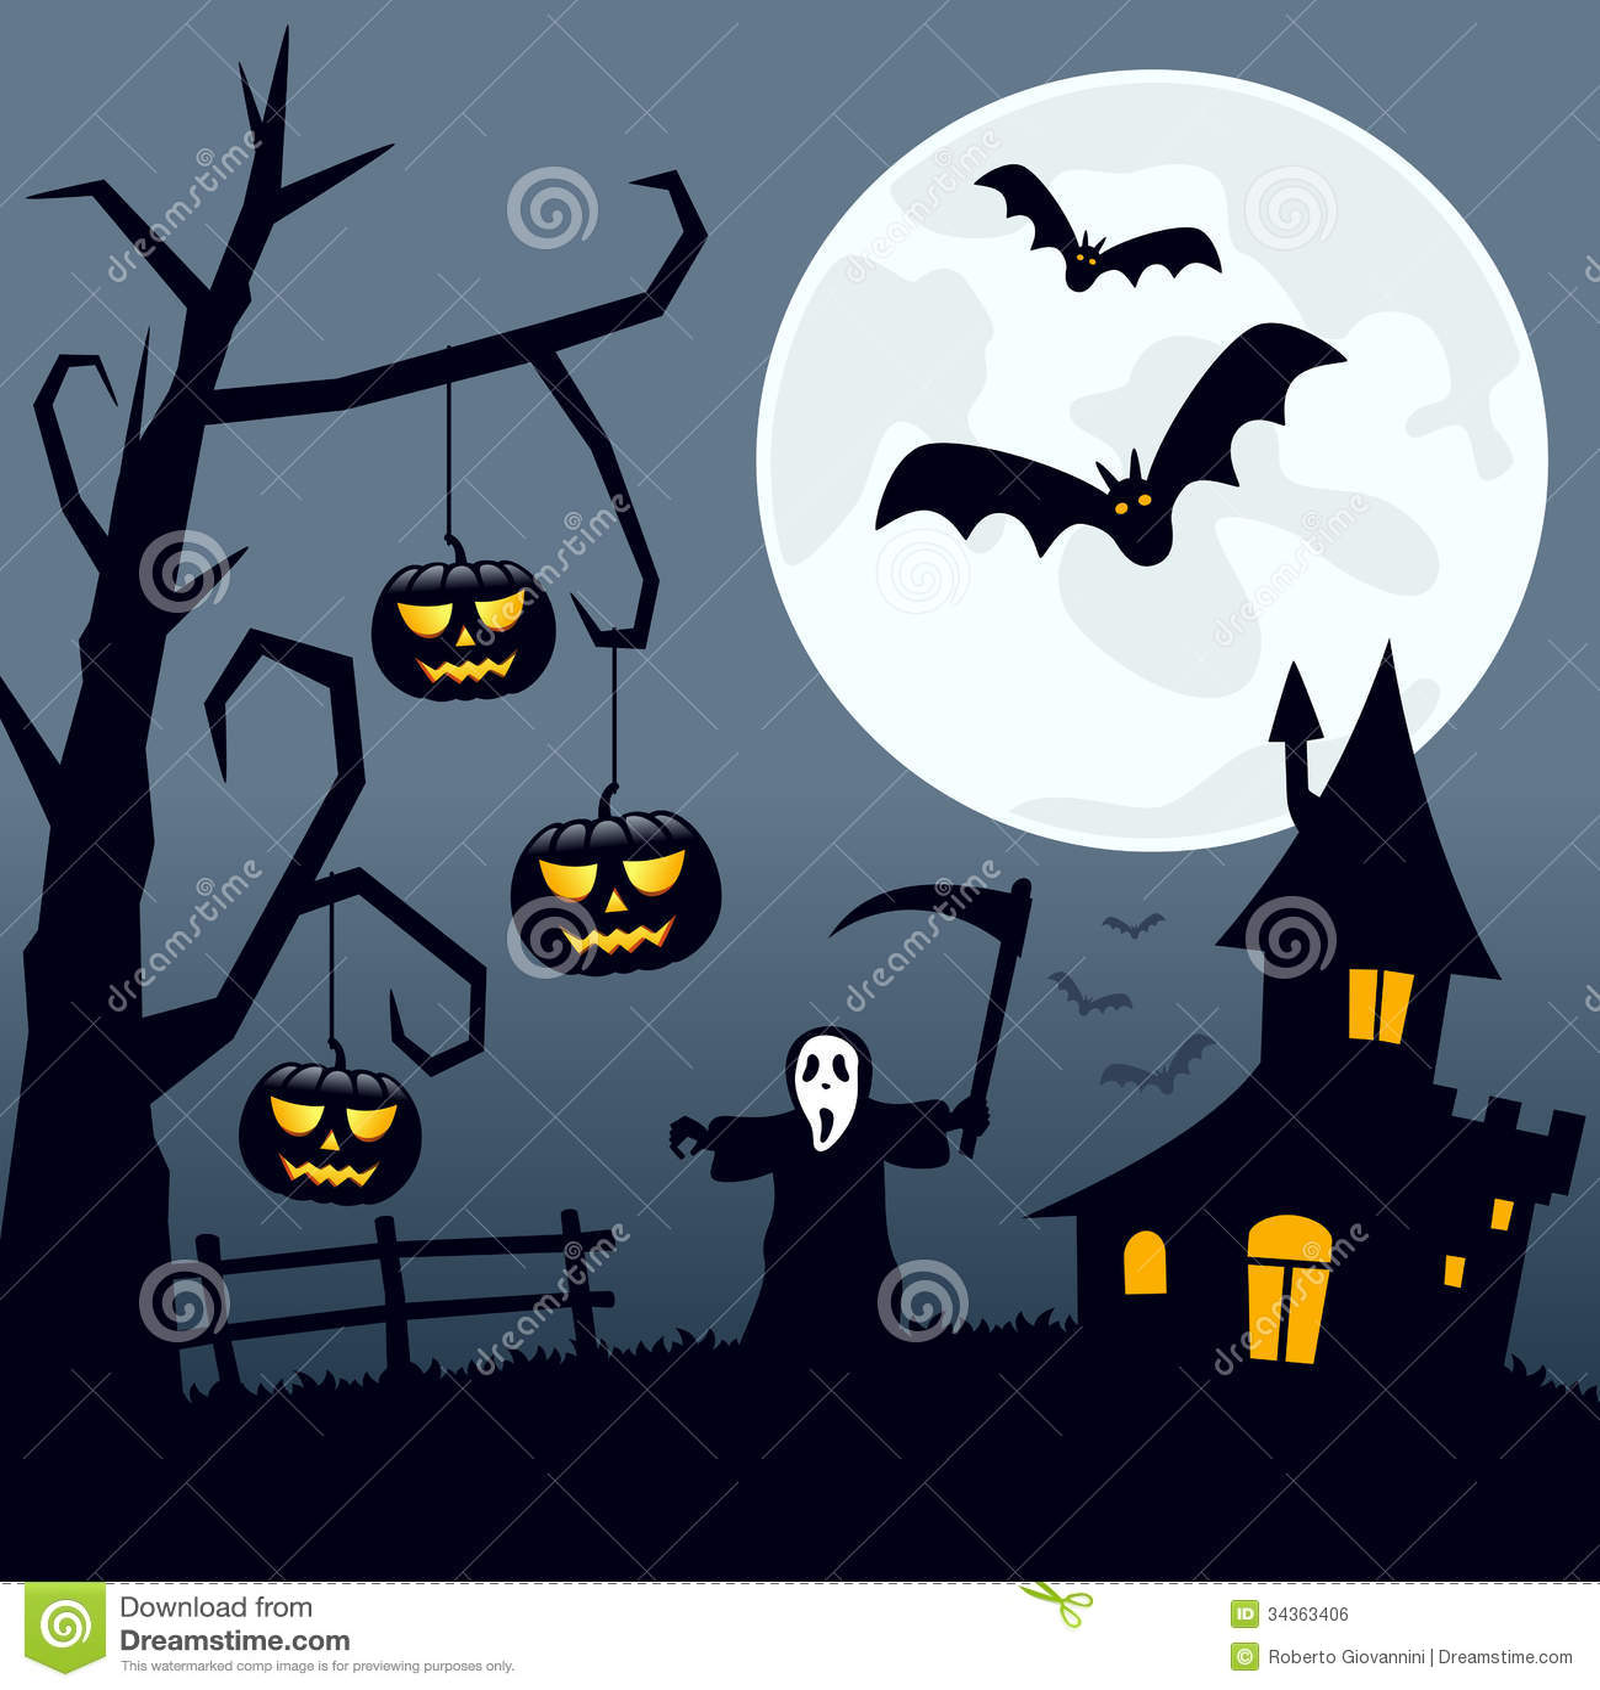 Fall Graveyard Cemetery Wallpaper Paysage Effrayant De Halloween Illustration De Vecteur